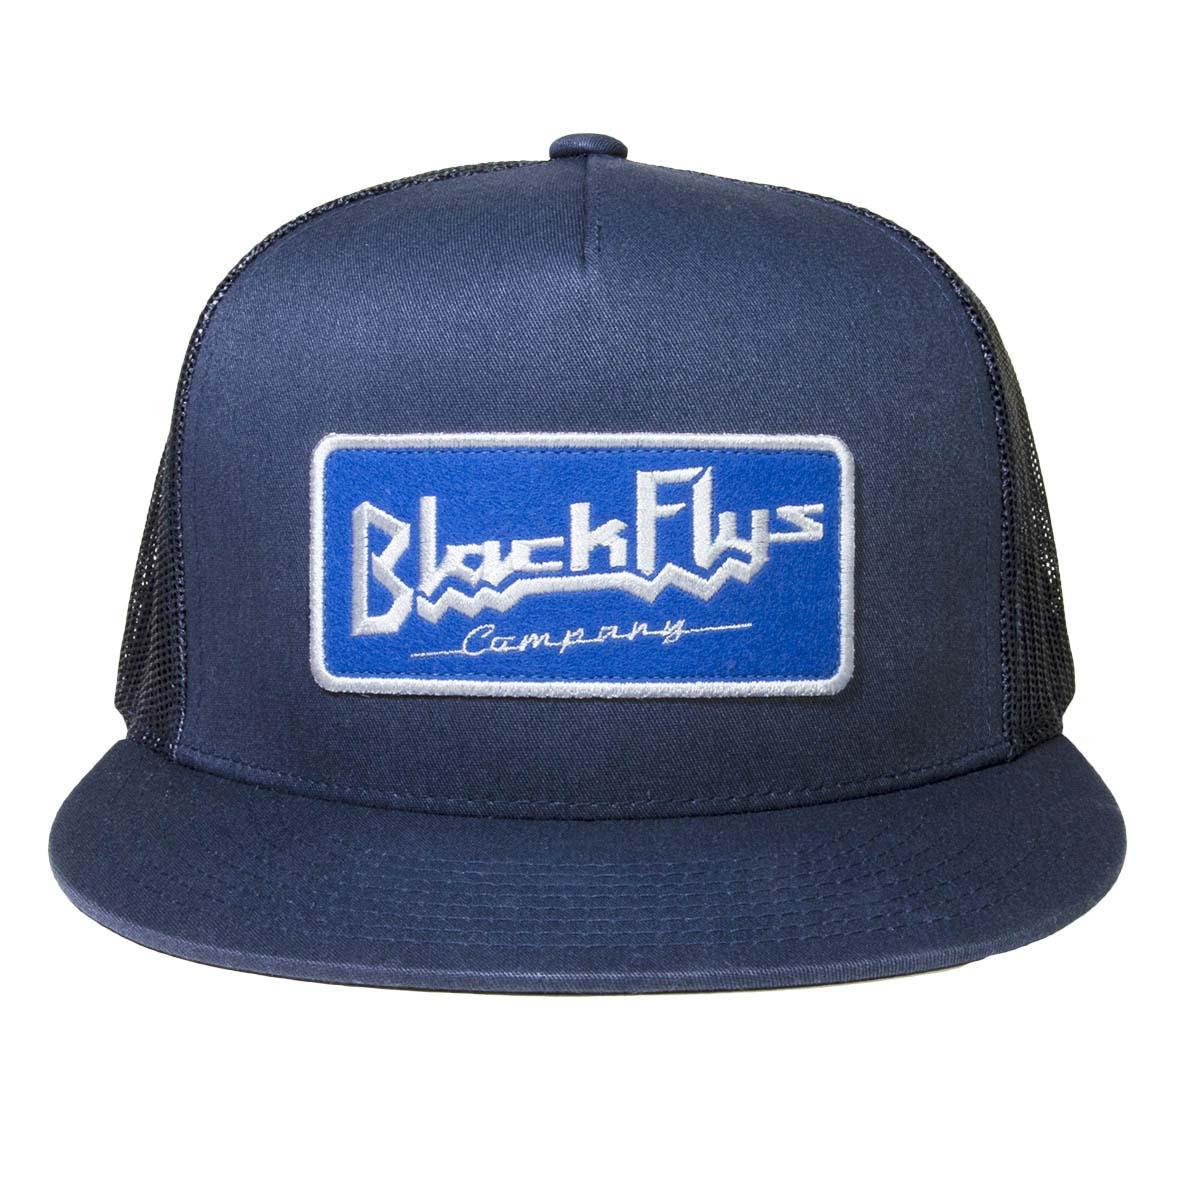 PRIEST SNAP BACK CAP